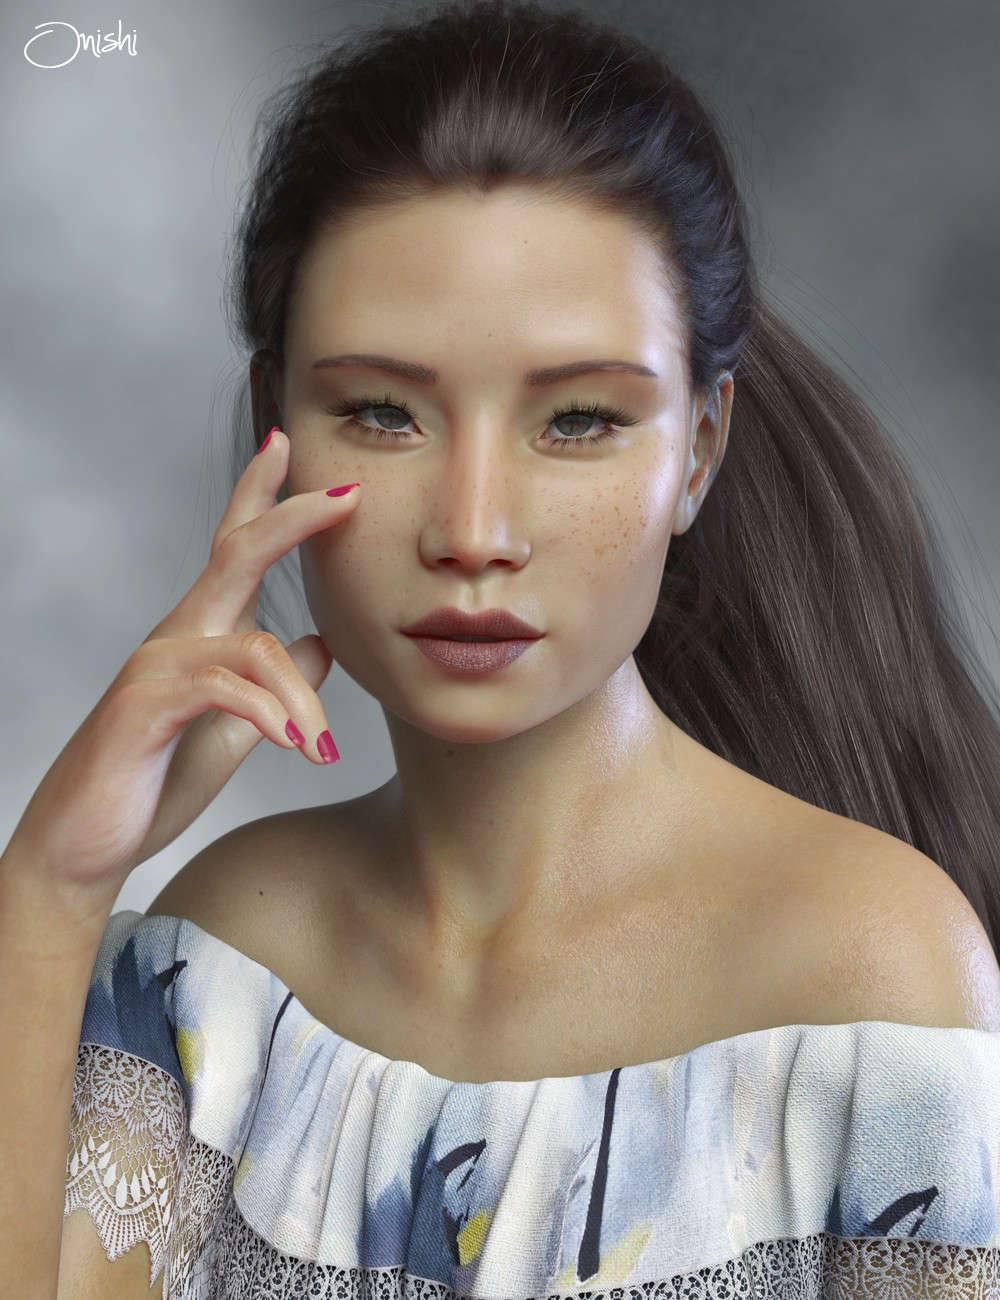 Lucy Liu - PS Onishi Genesis 8 & Victoria 8  Celebrity 3D